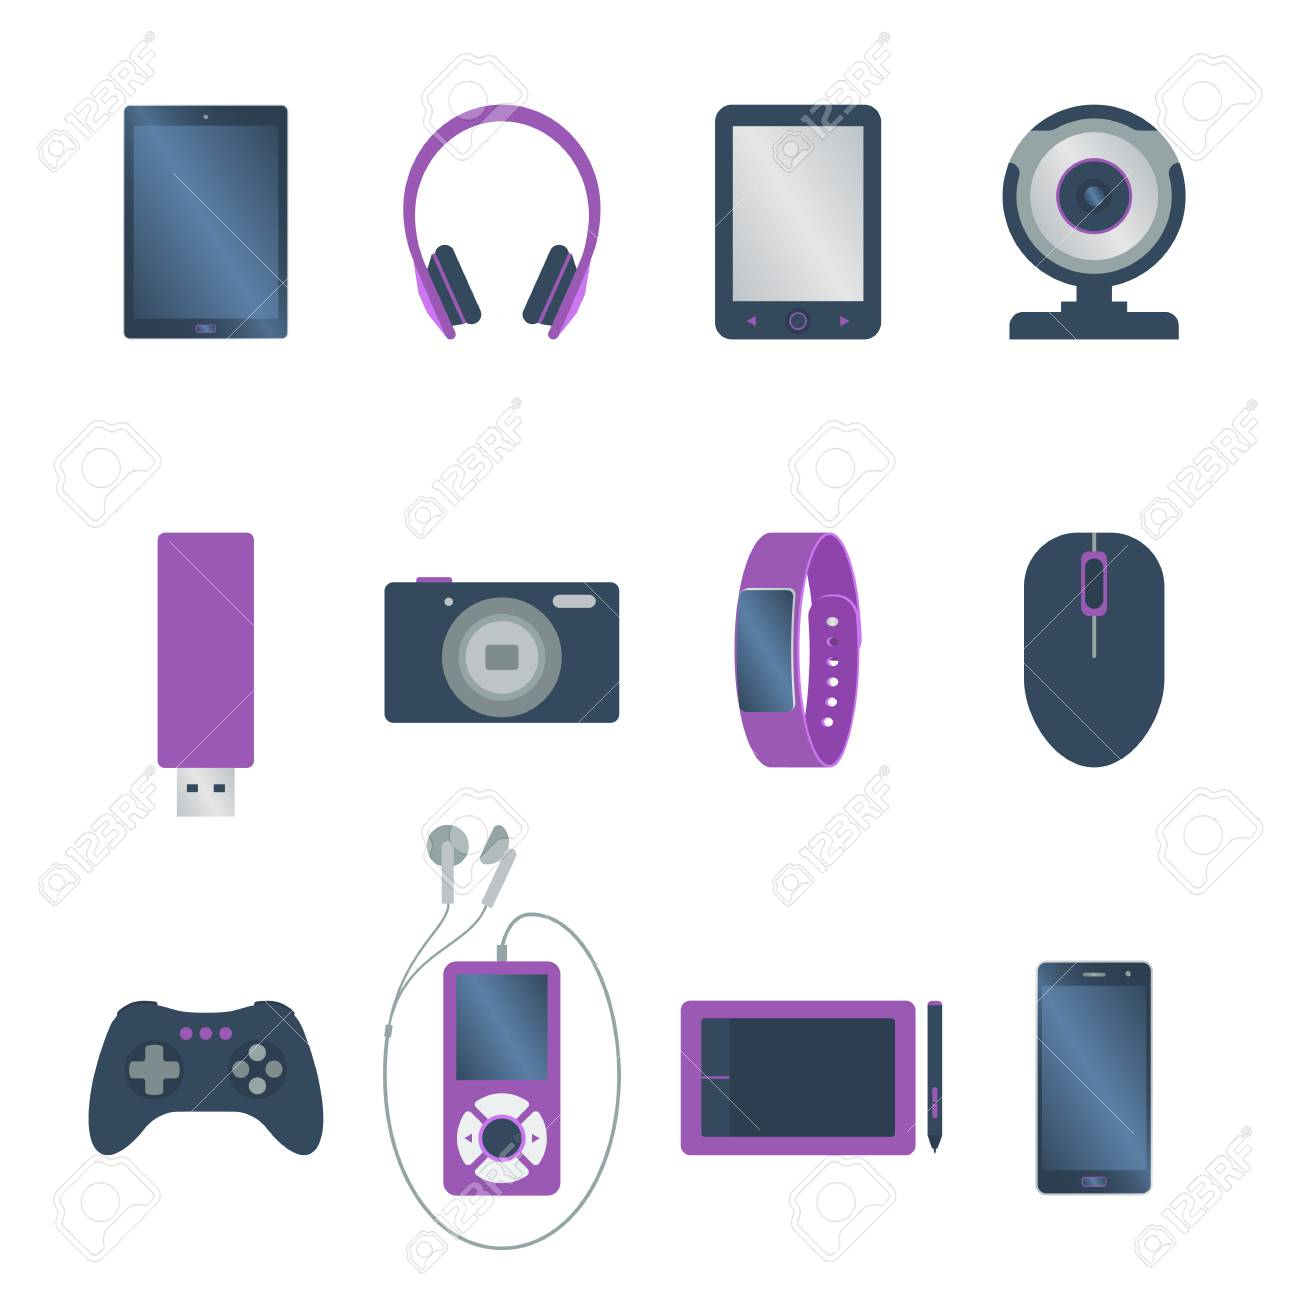 Sistema De Artilugio Electrónico Coloreado Aislado Lector De Libro Tableta Cámara Web Teléfono Inteligente Auricular Ratón De La Computadora